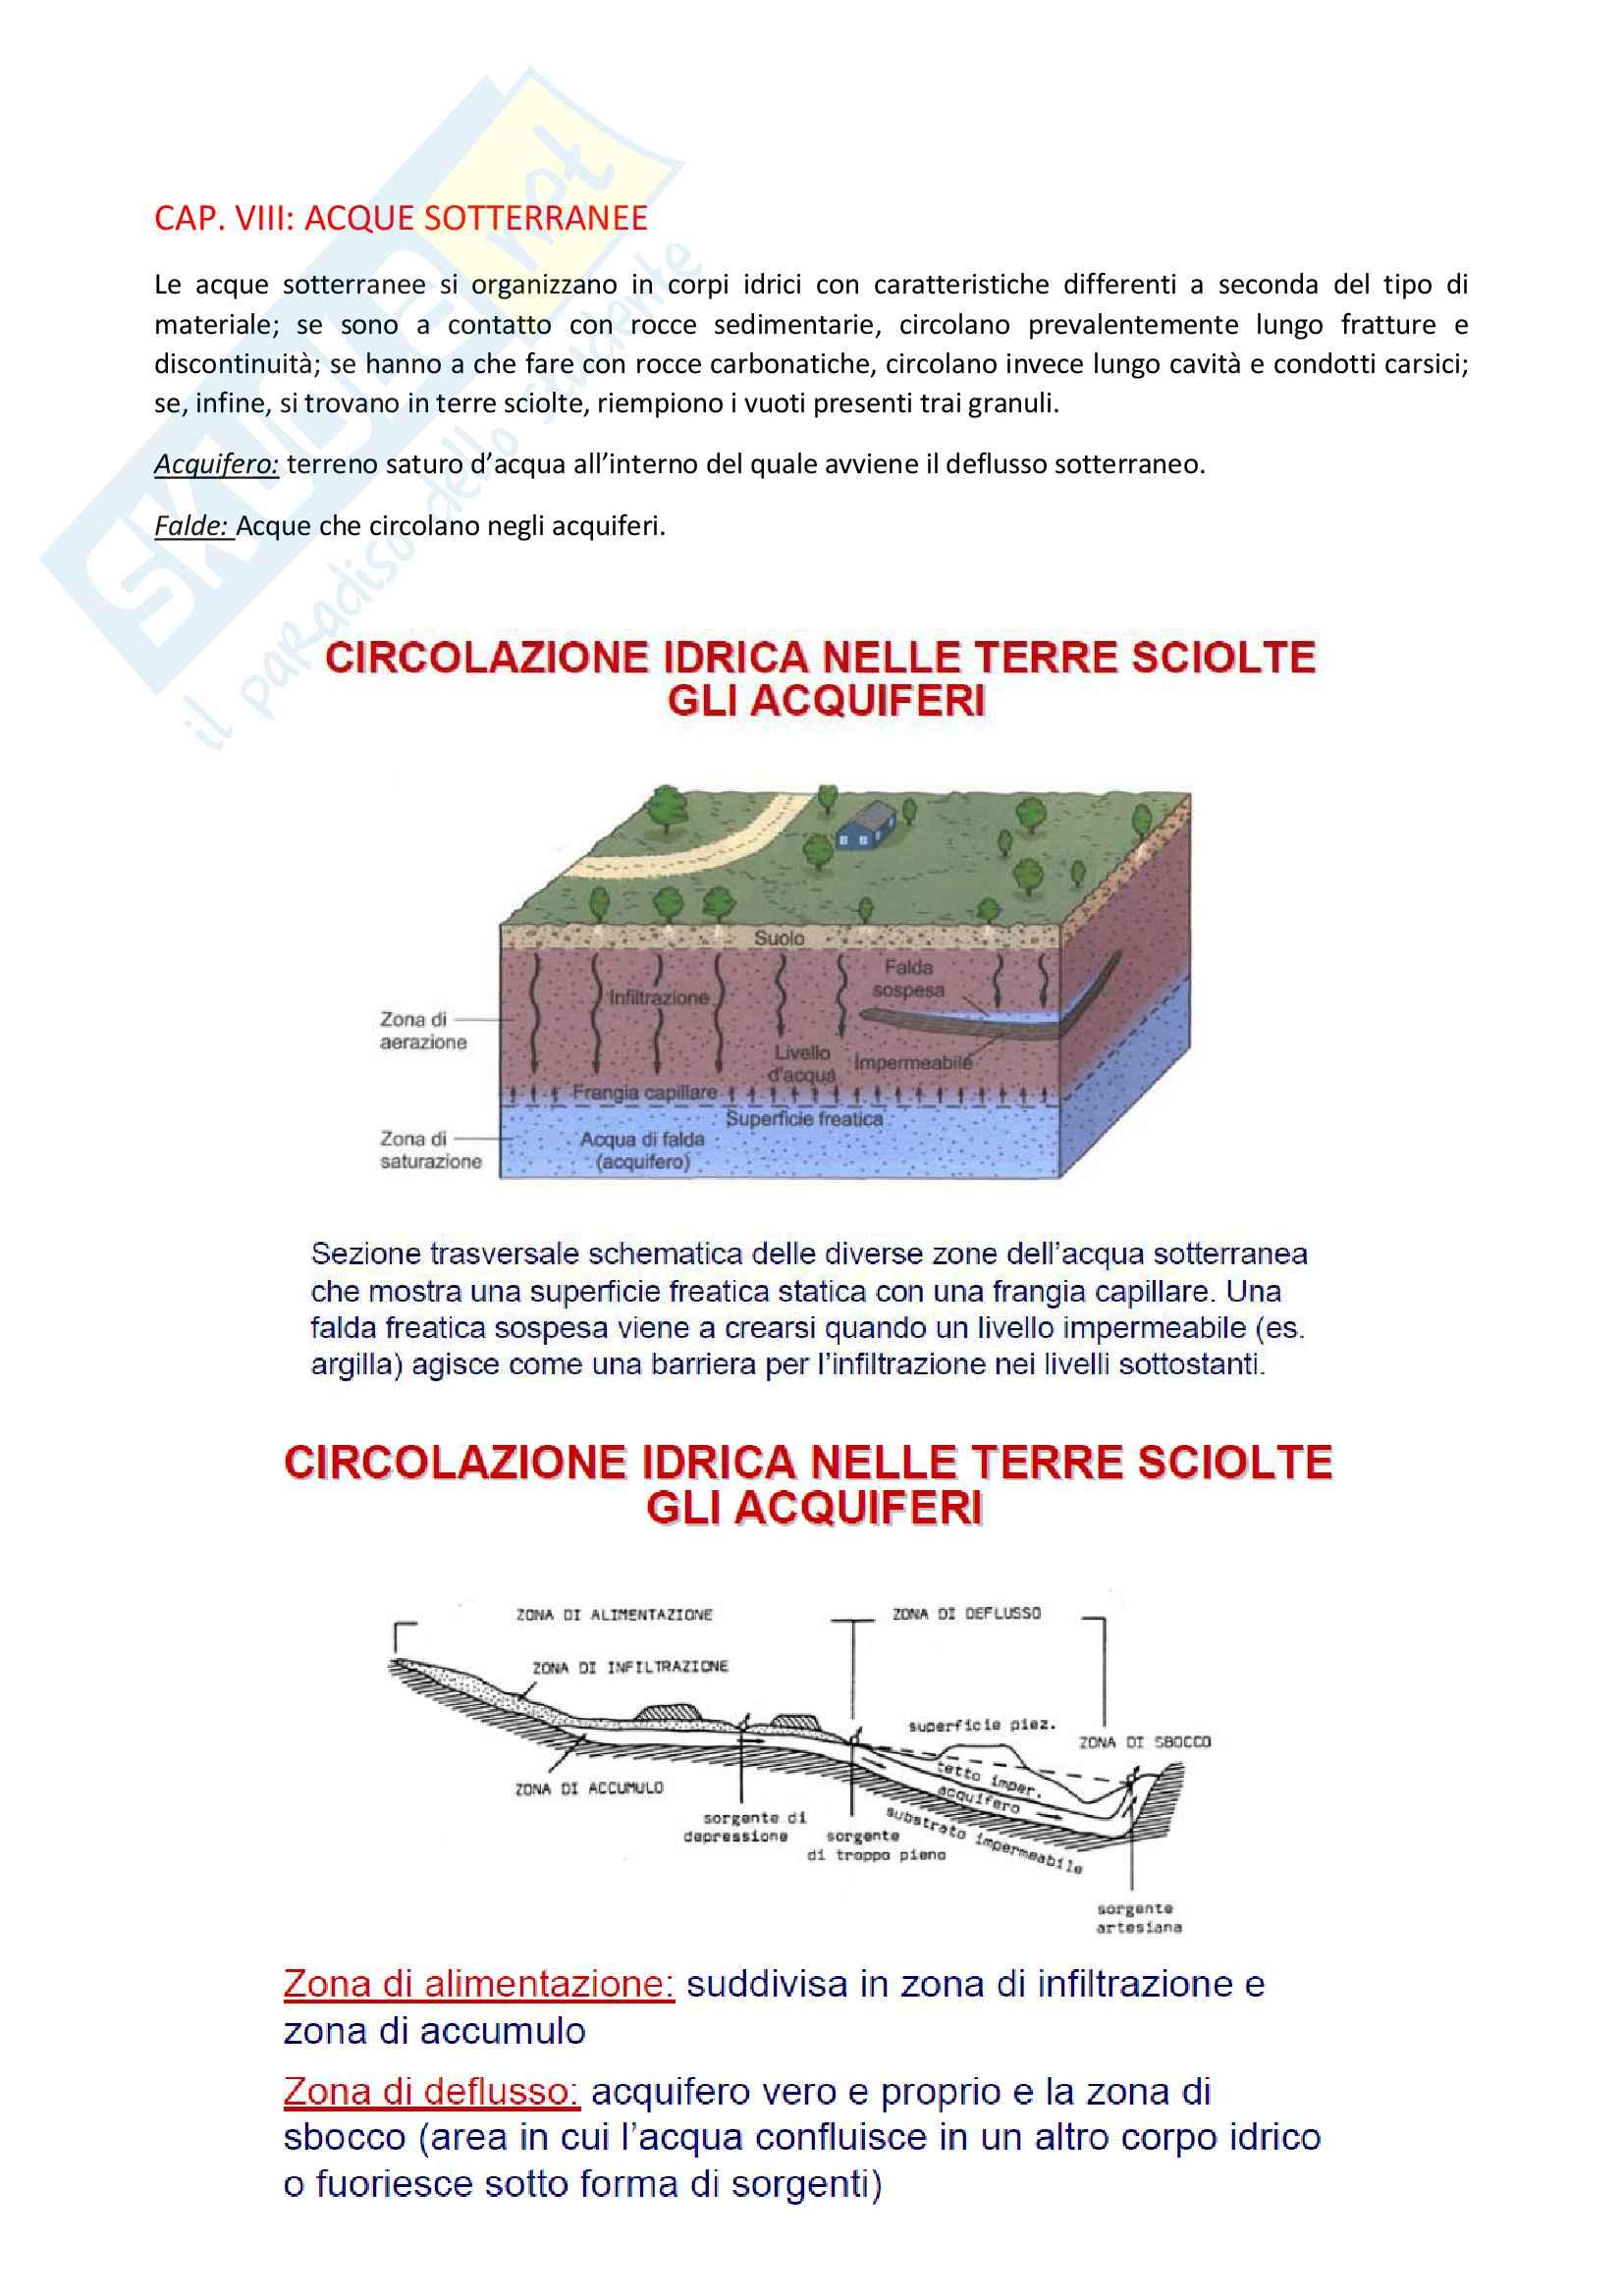 Elementi di geologia e geomorfologia - appunti Pag. 36